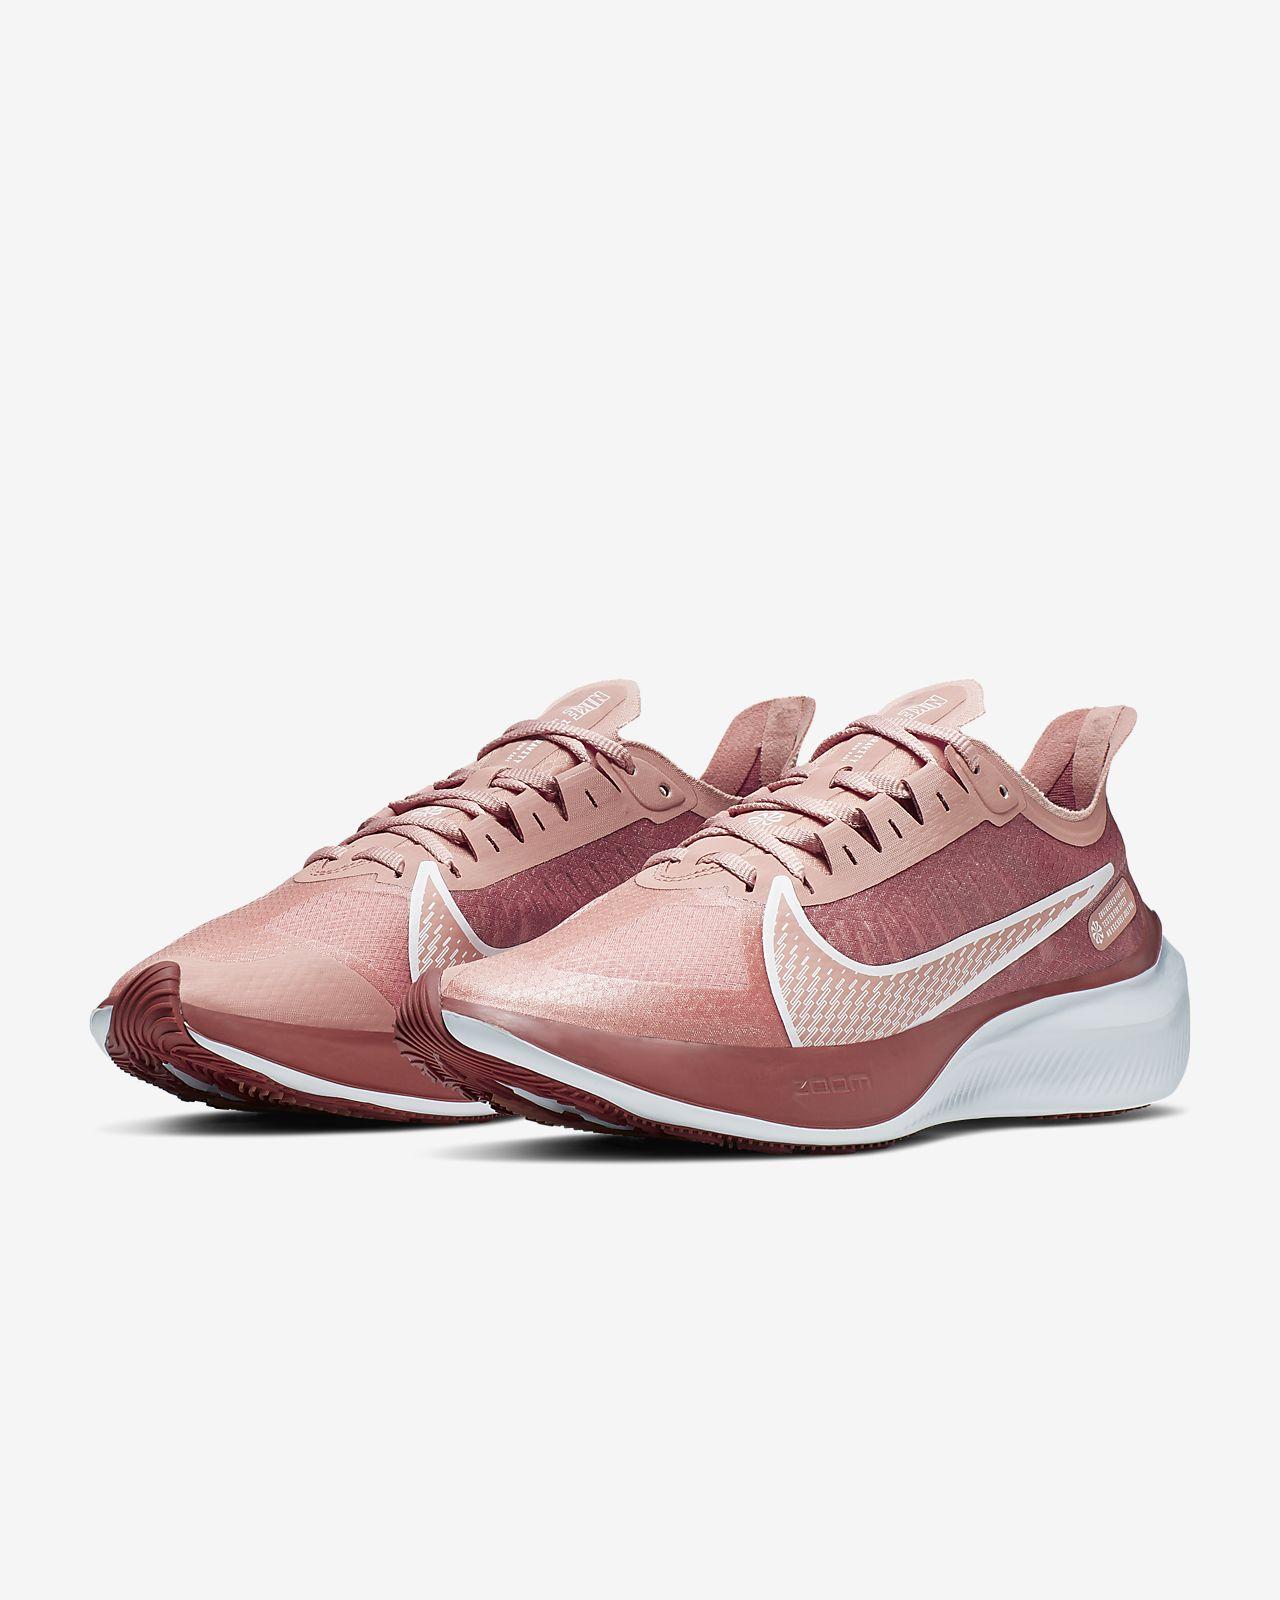 Nike Zoom Gravity Damen Laufschuh Pink Quartz